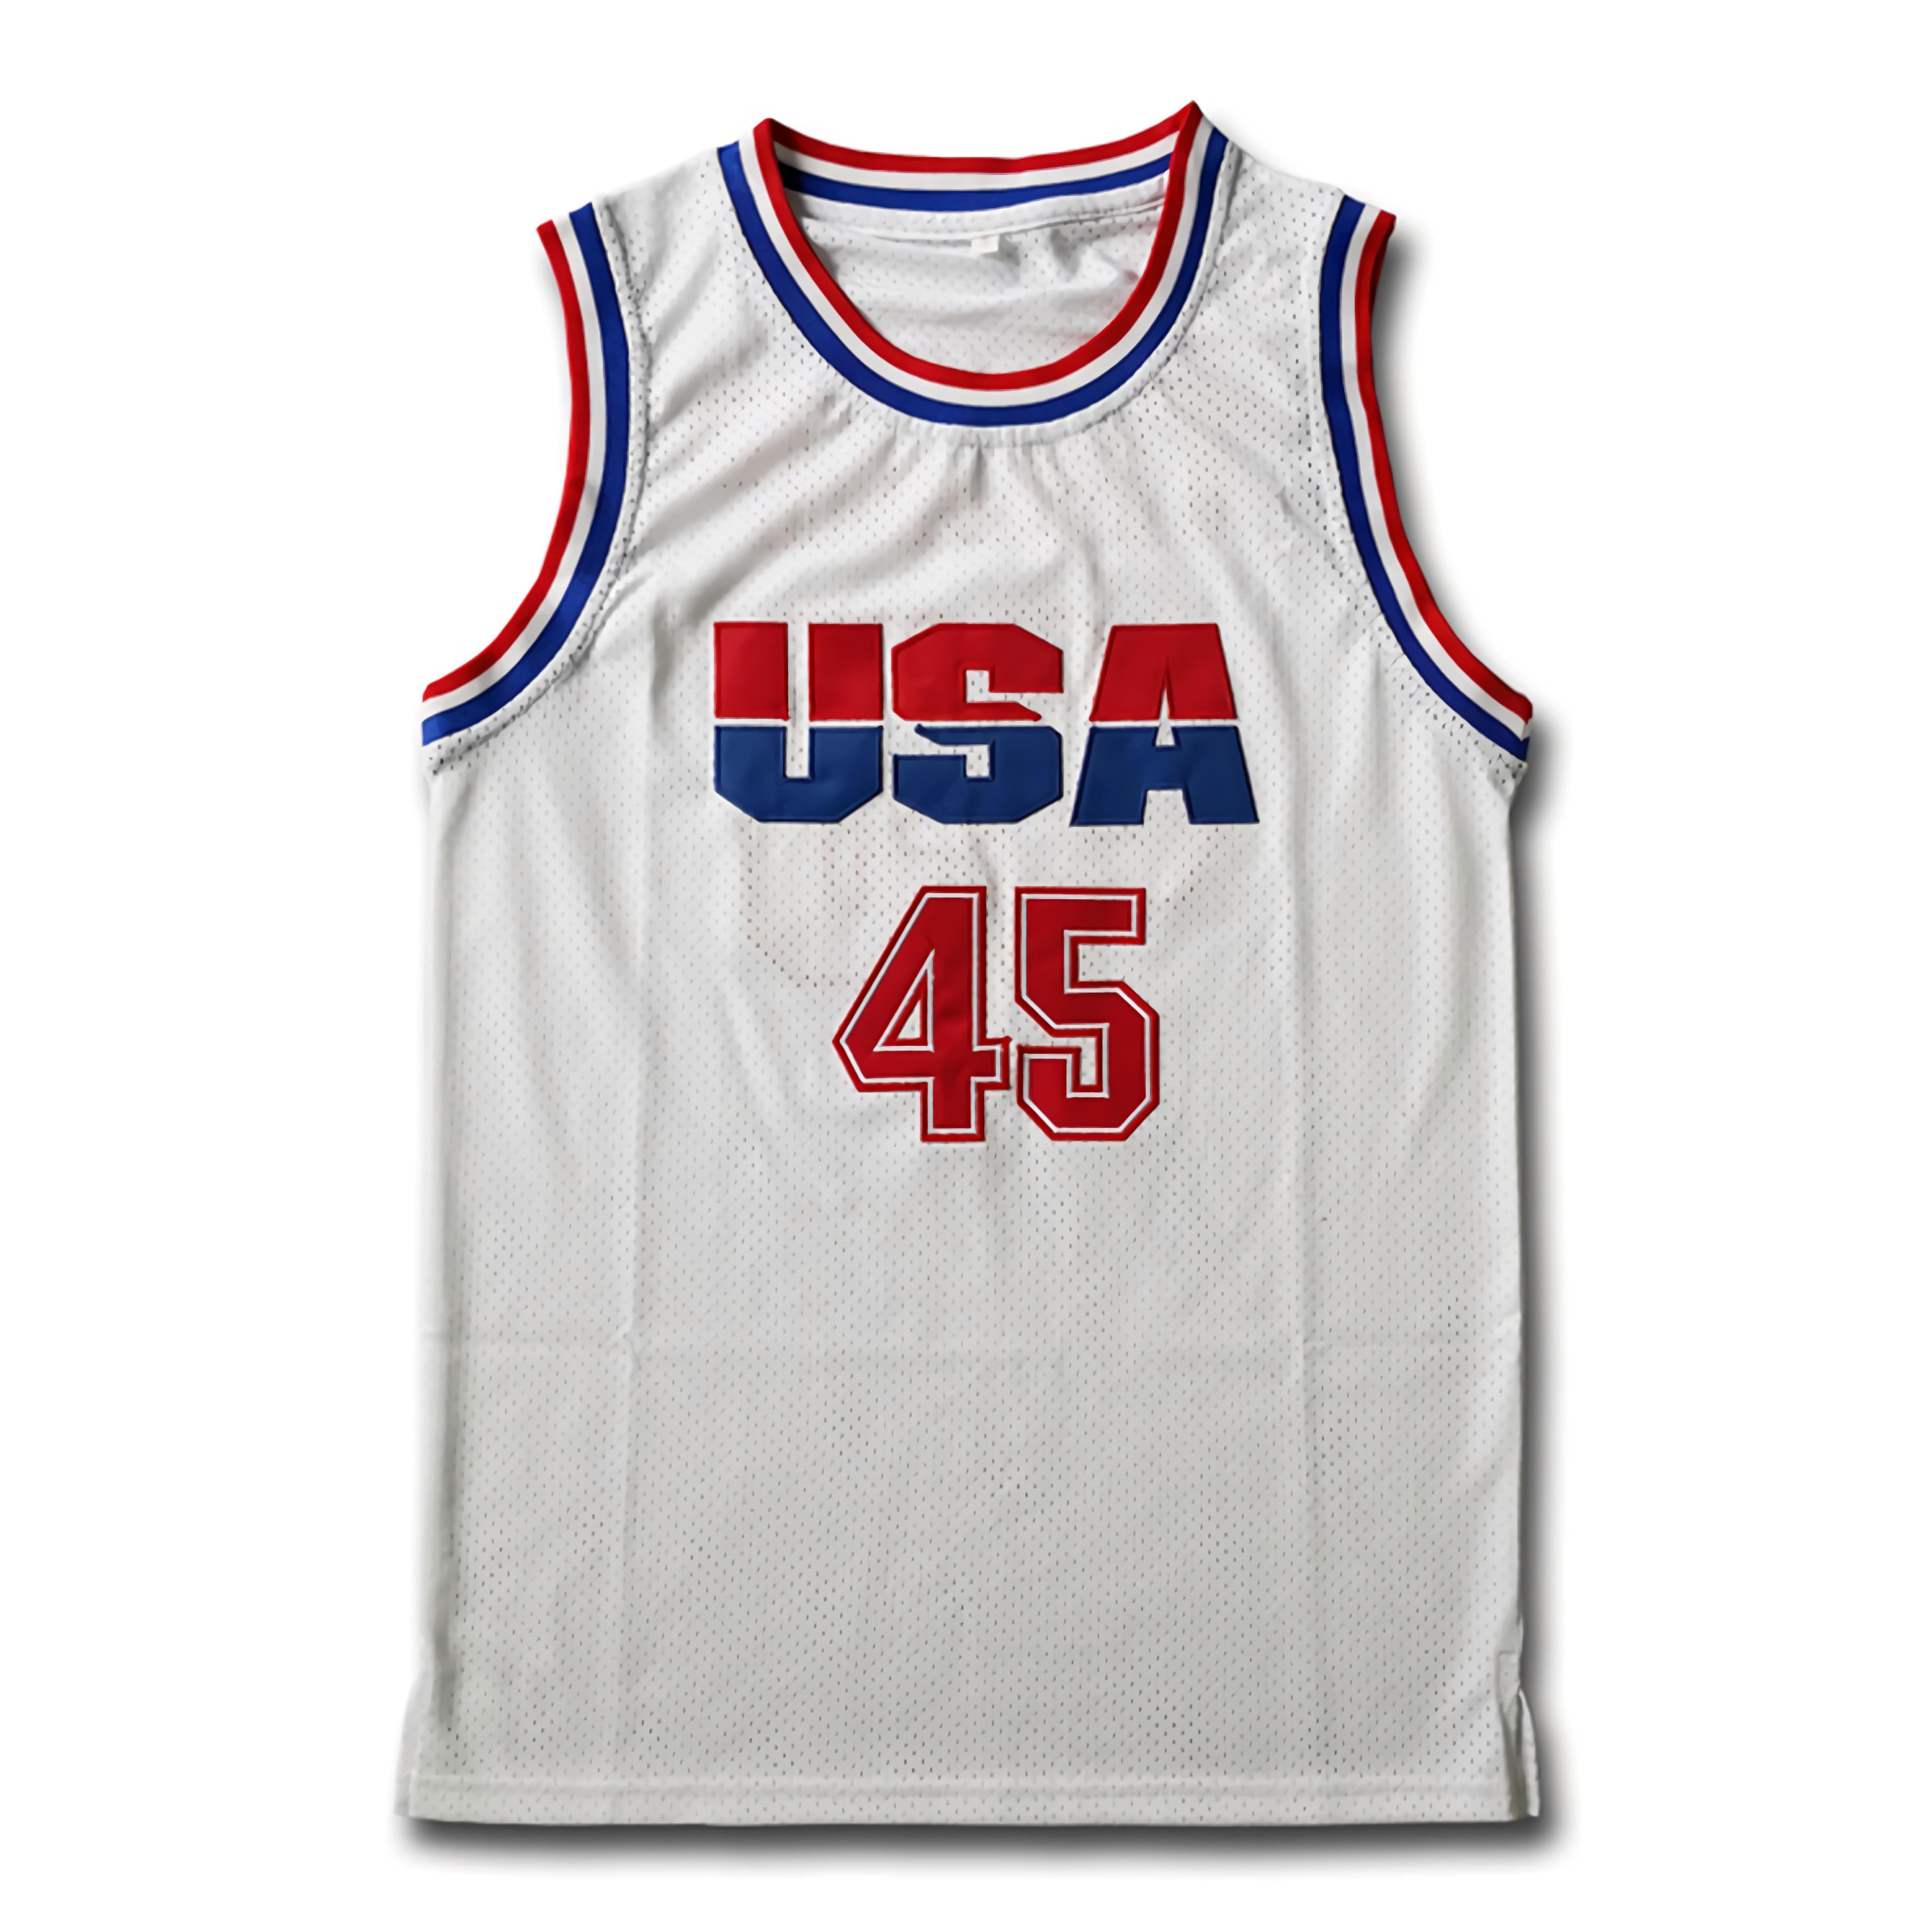 45# 2016 Commemorative Edition USA Basketball Jersey White S-3XL